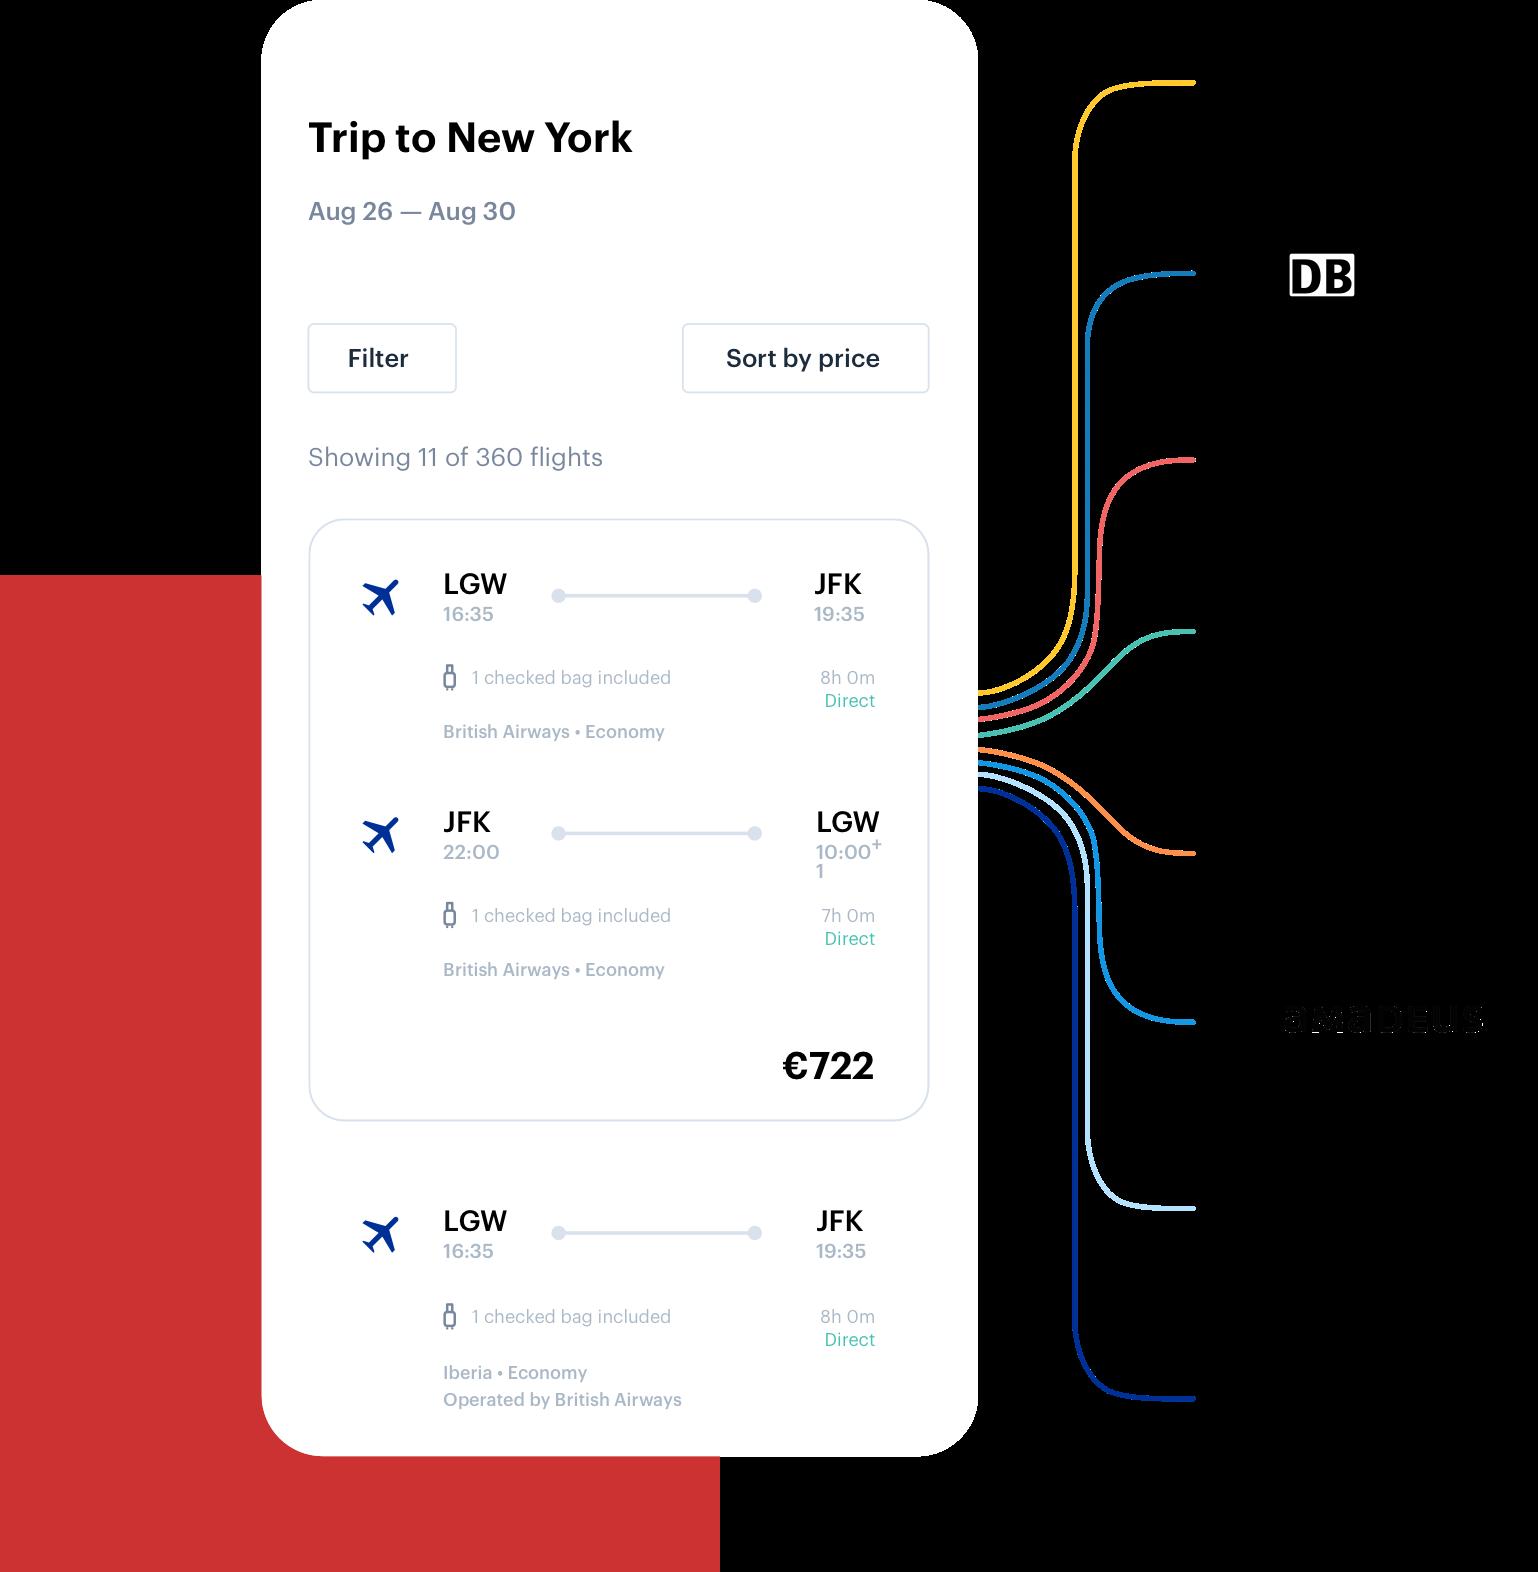 New York trip itinerary